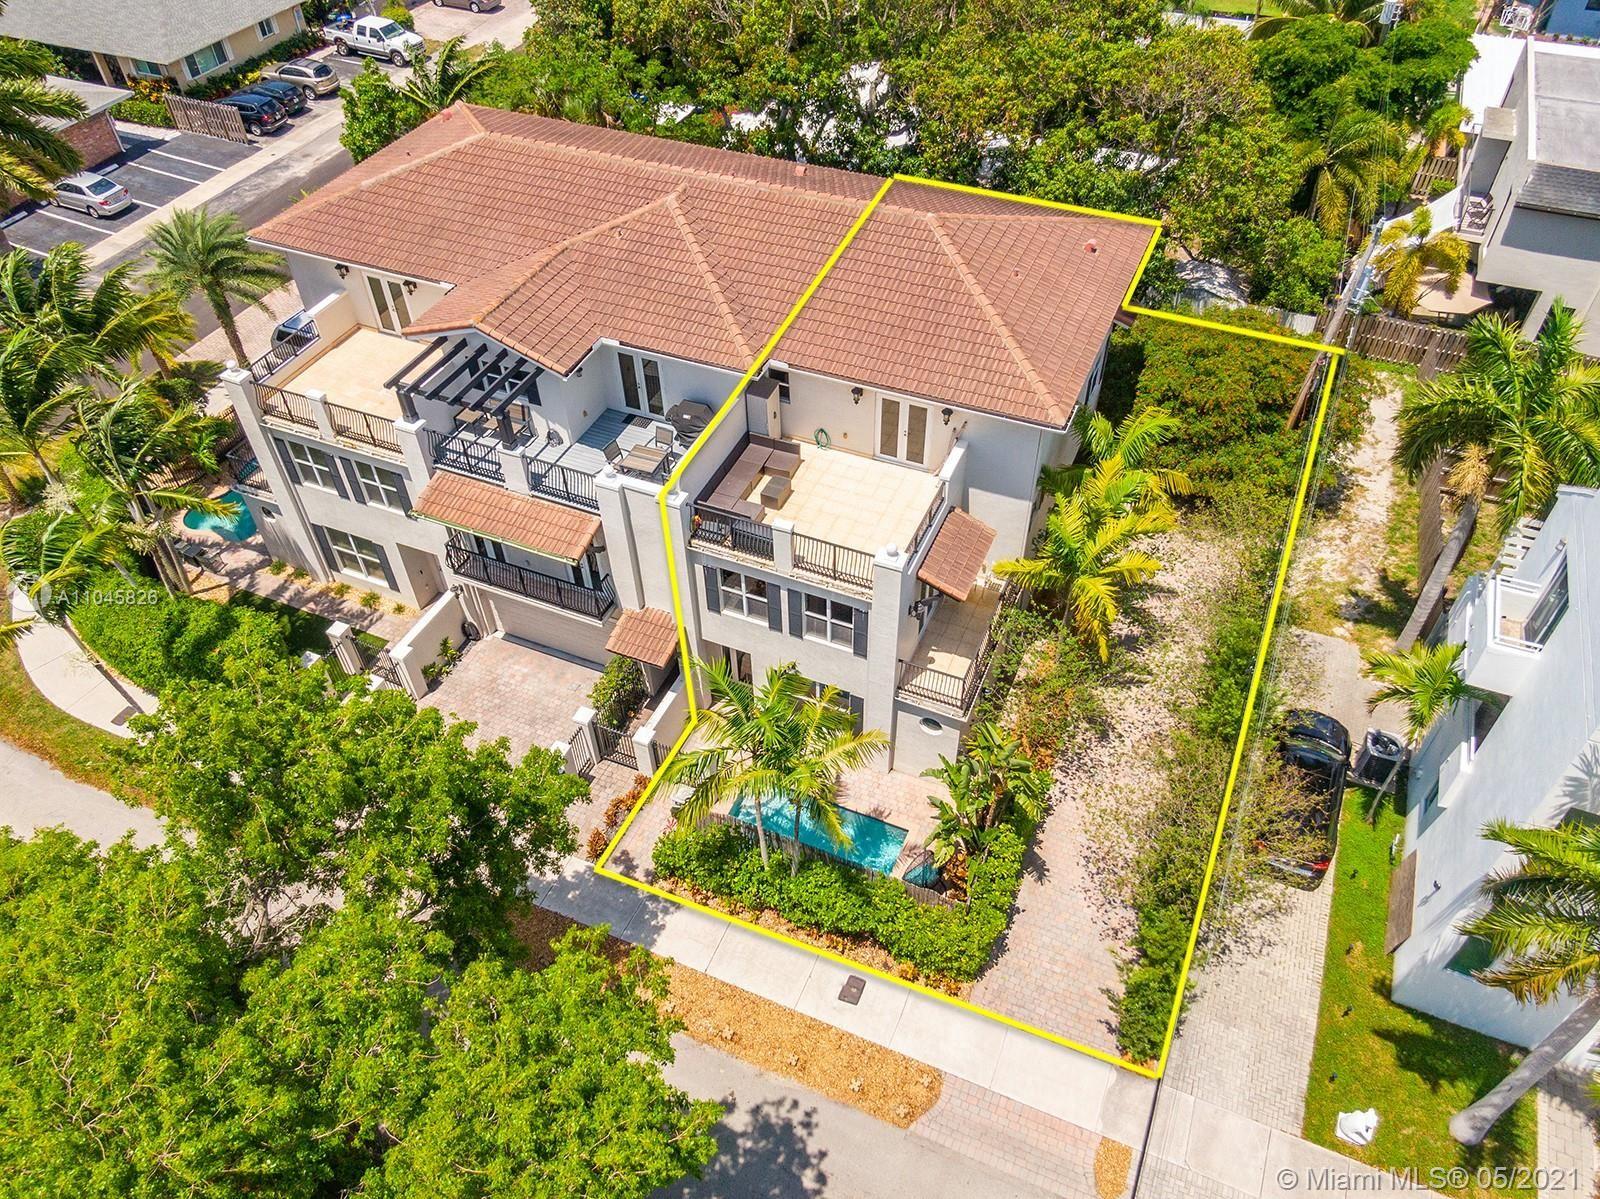 539 NE 15th Ave, Fort Lauderdale, FL 33301 - #: A11045826